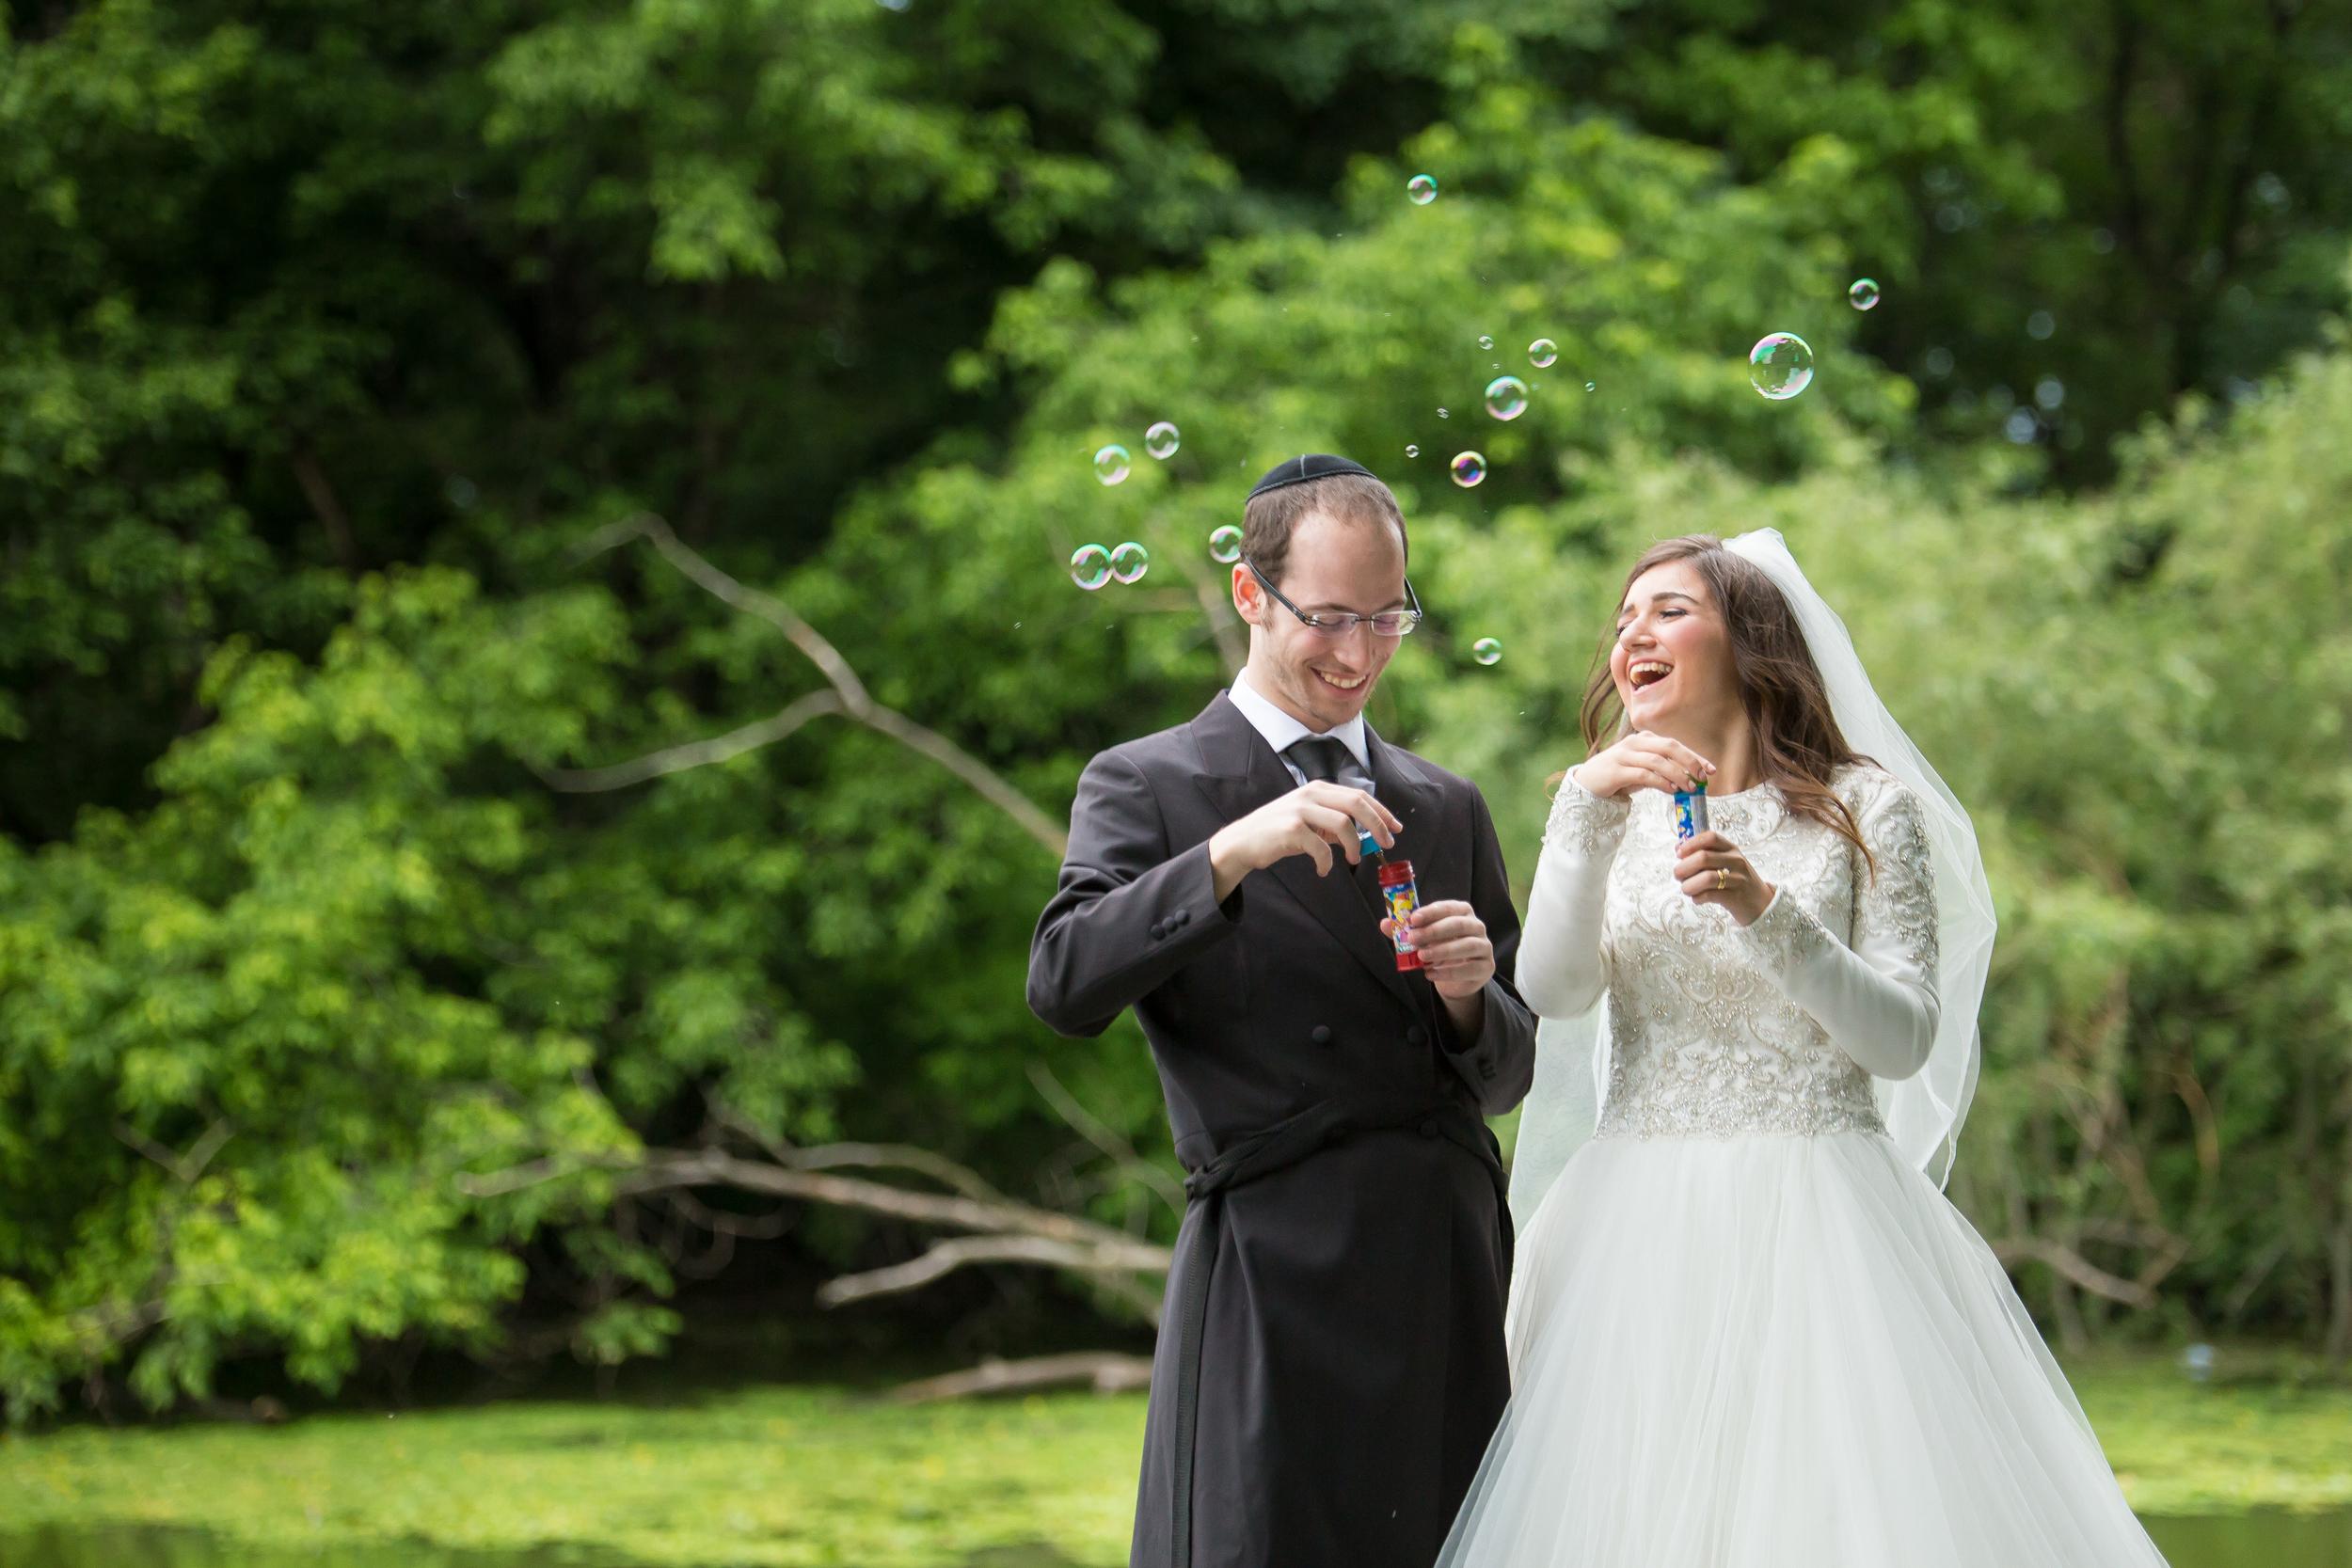 Wedding Iossi and Gitty Khafif  - Eliau Piha studio photography, new york, events, people 770 brooklyn -0703.jpg